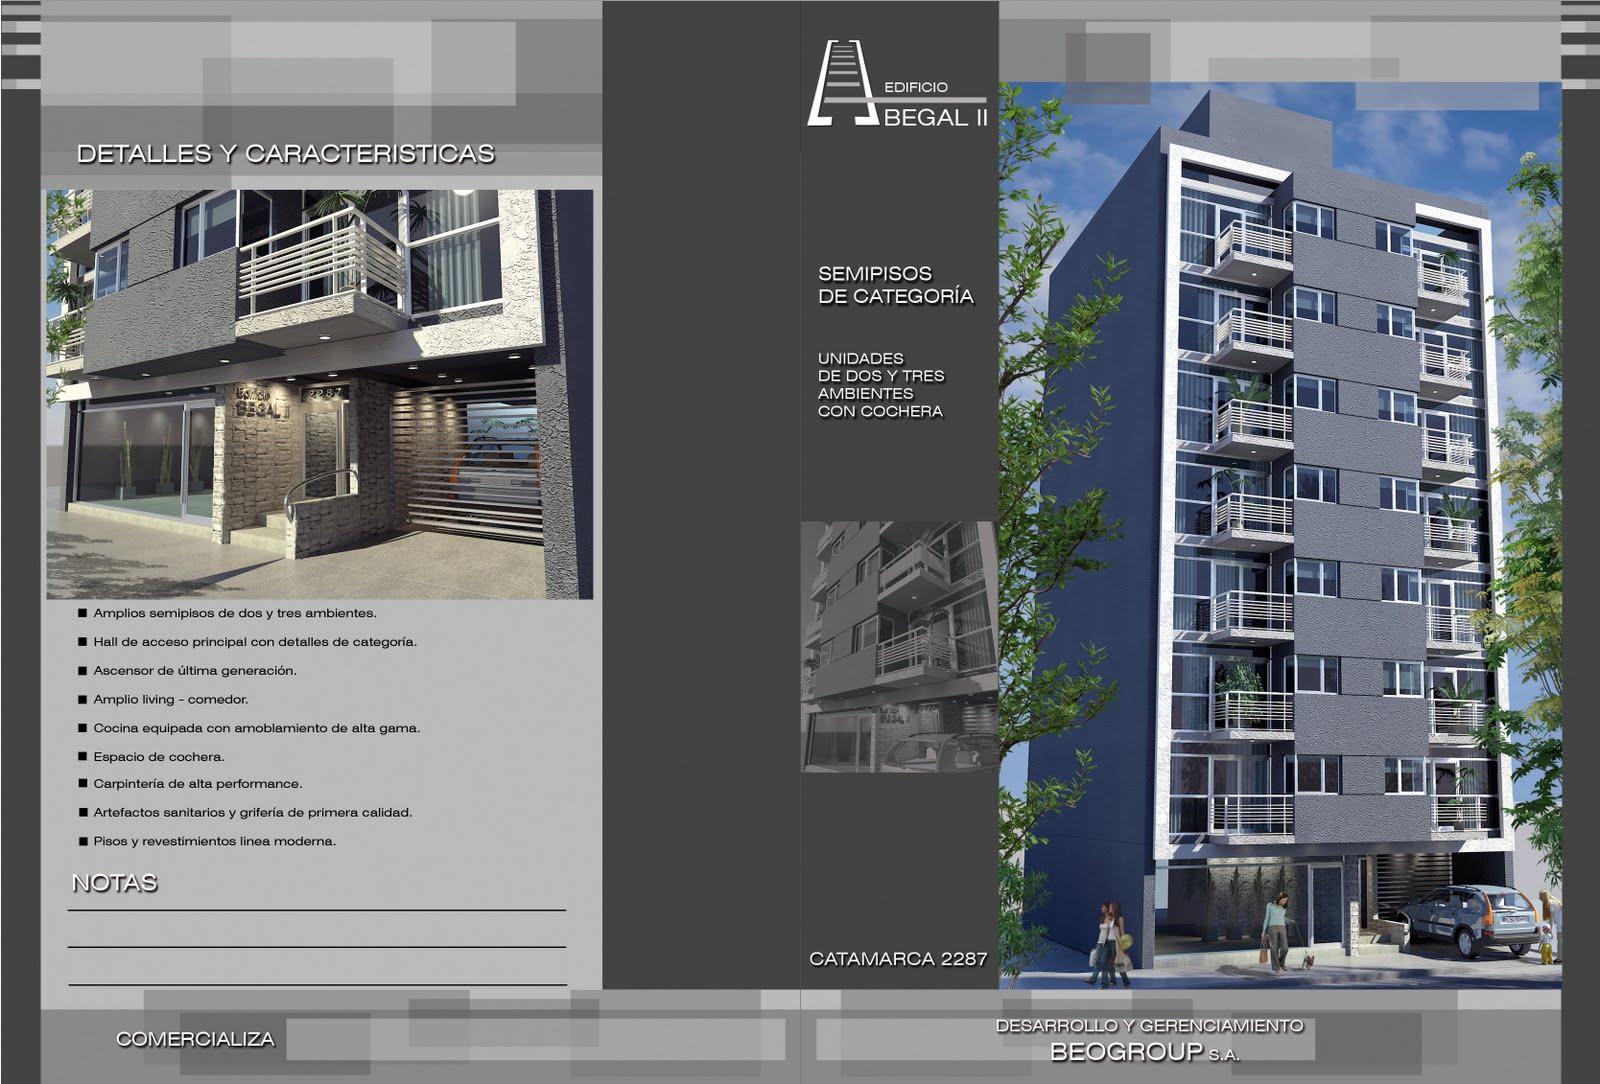 R e n f i s arquitectura digital promoci n inmobiliaria for Promocion inmobiliaria